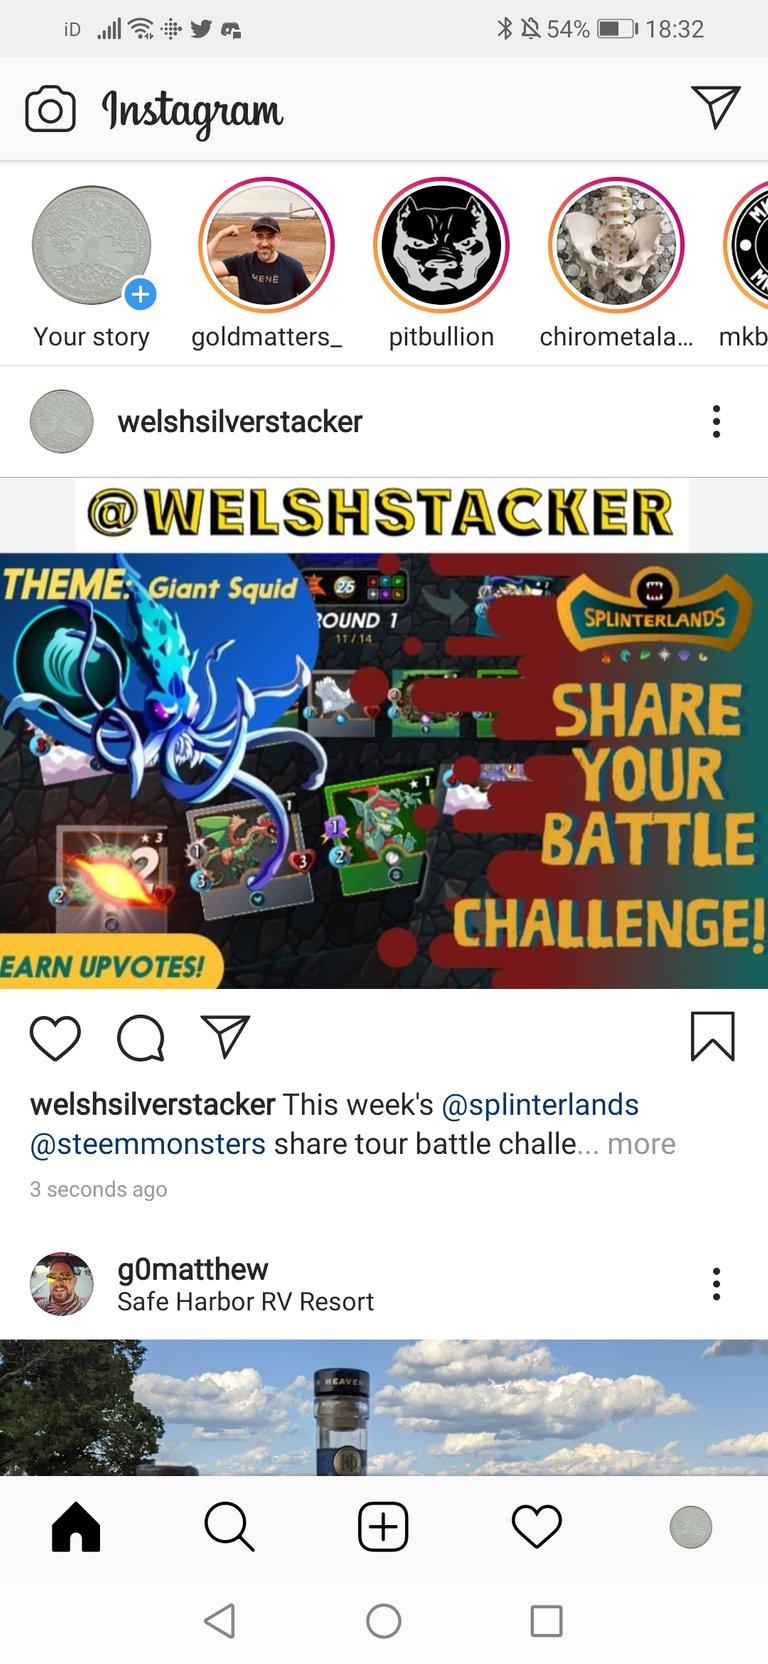 Screenshot_20200511_183255_com.instagram.android.jpg